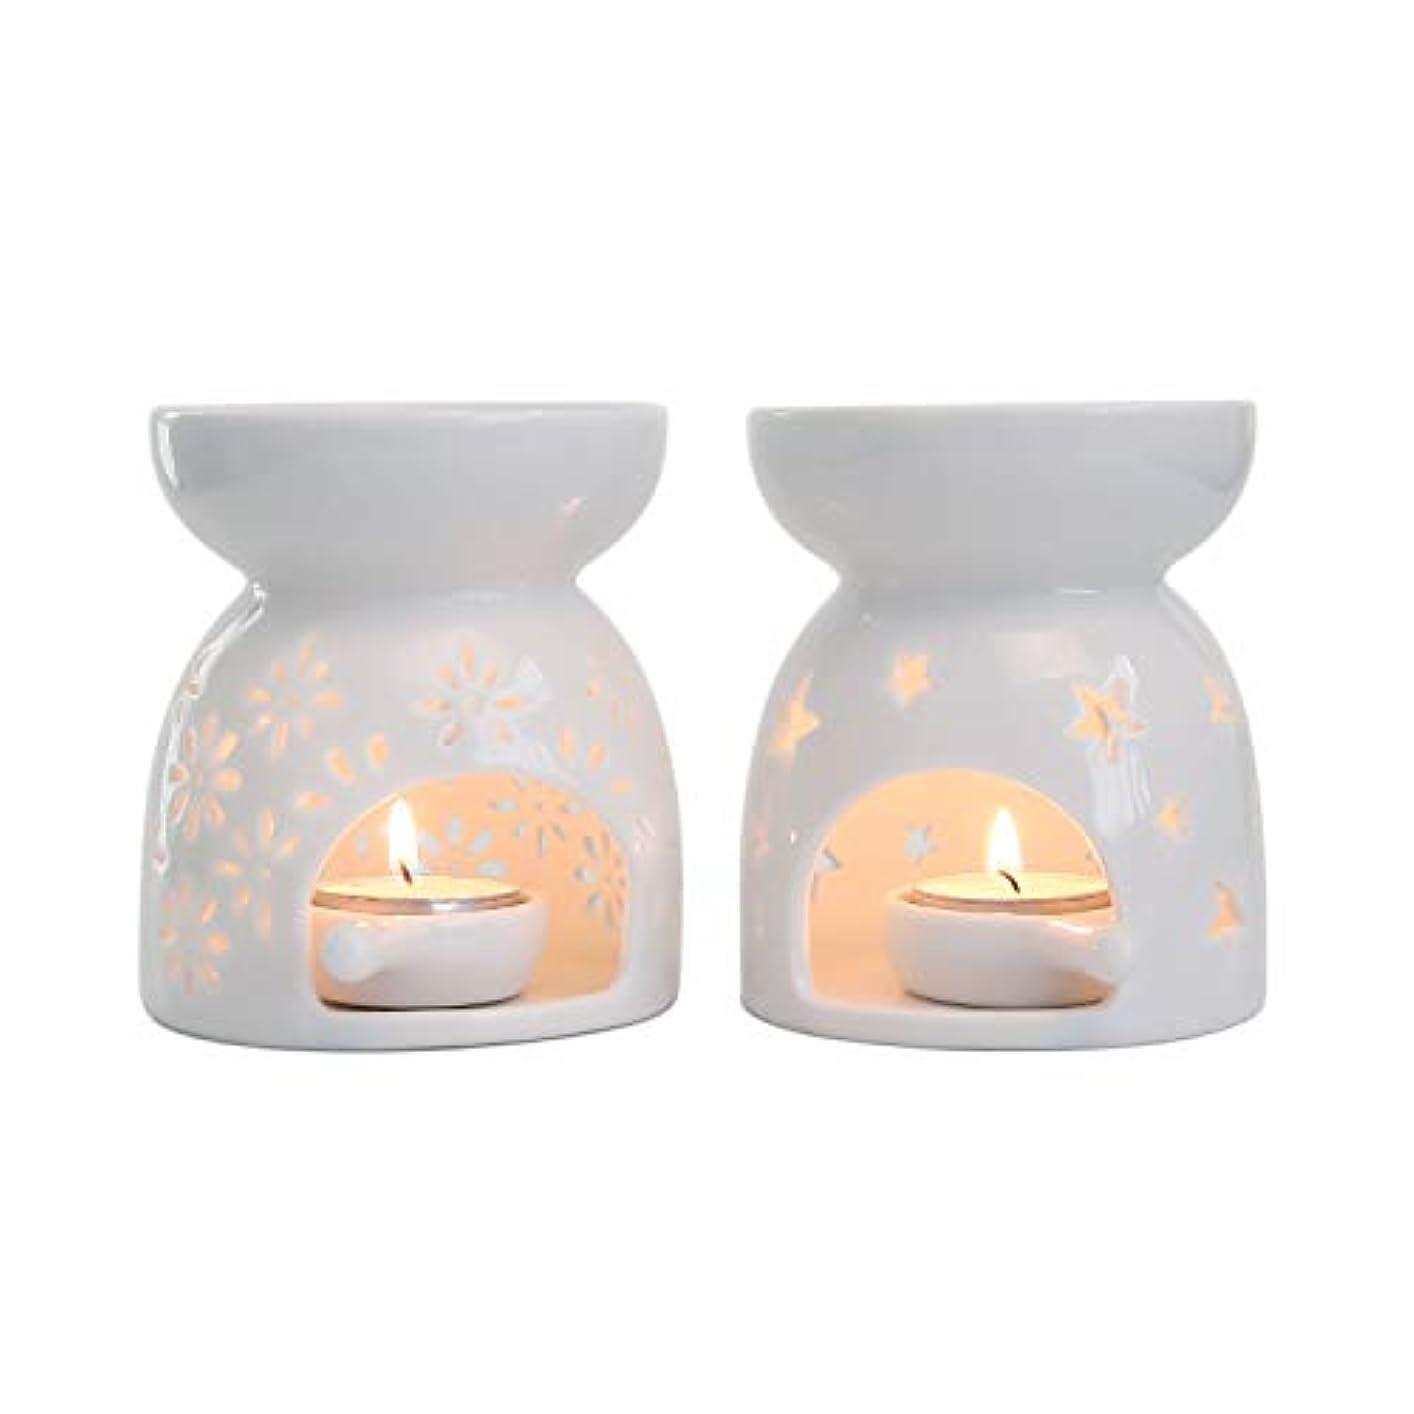 Rachel's Choice 陶製 アロマ ランプ ディフューザー アロマキャンドル キャンドルホルダー 花形&星形 ホワイト 2点セット